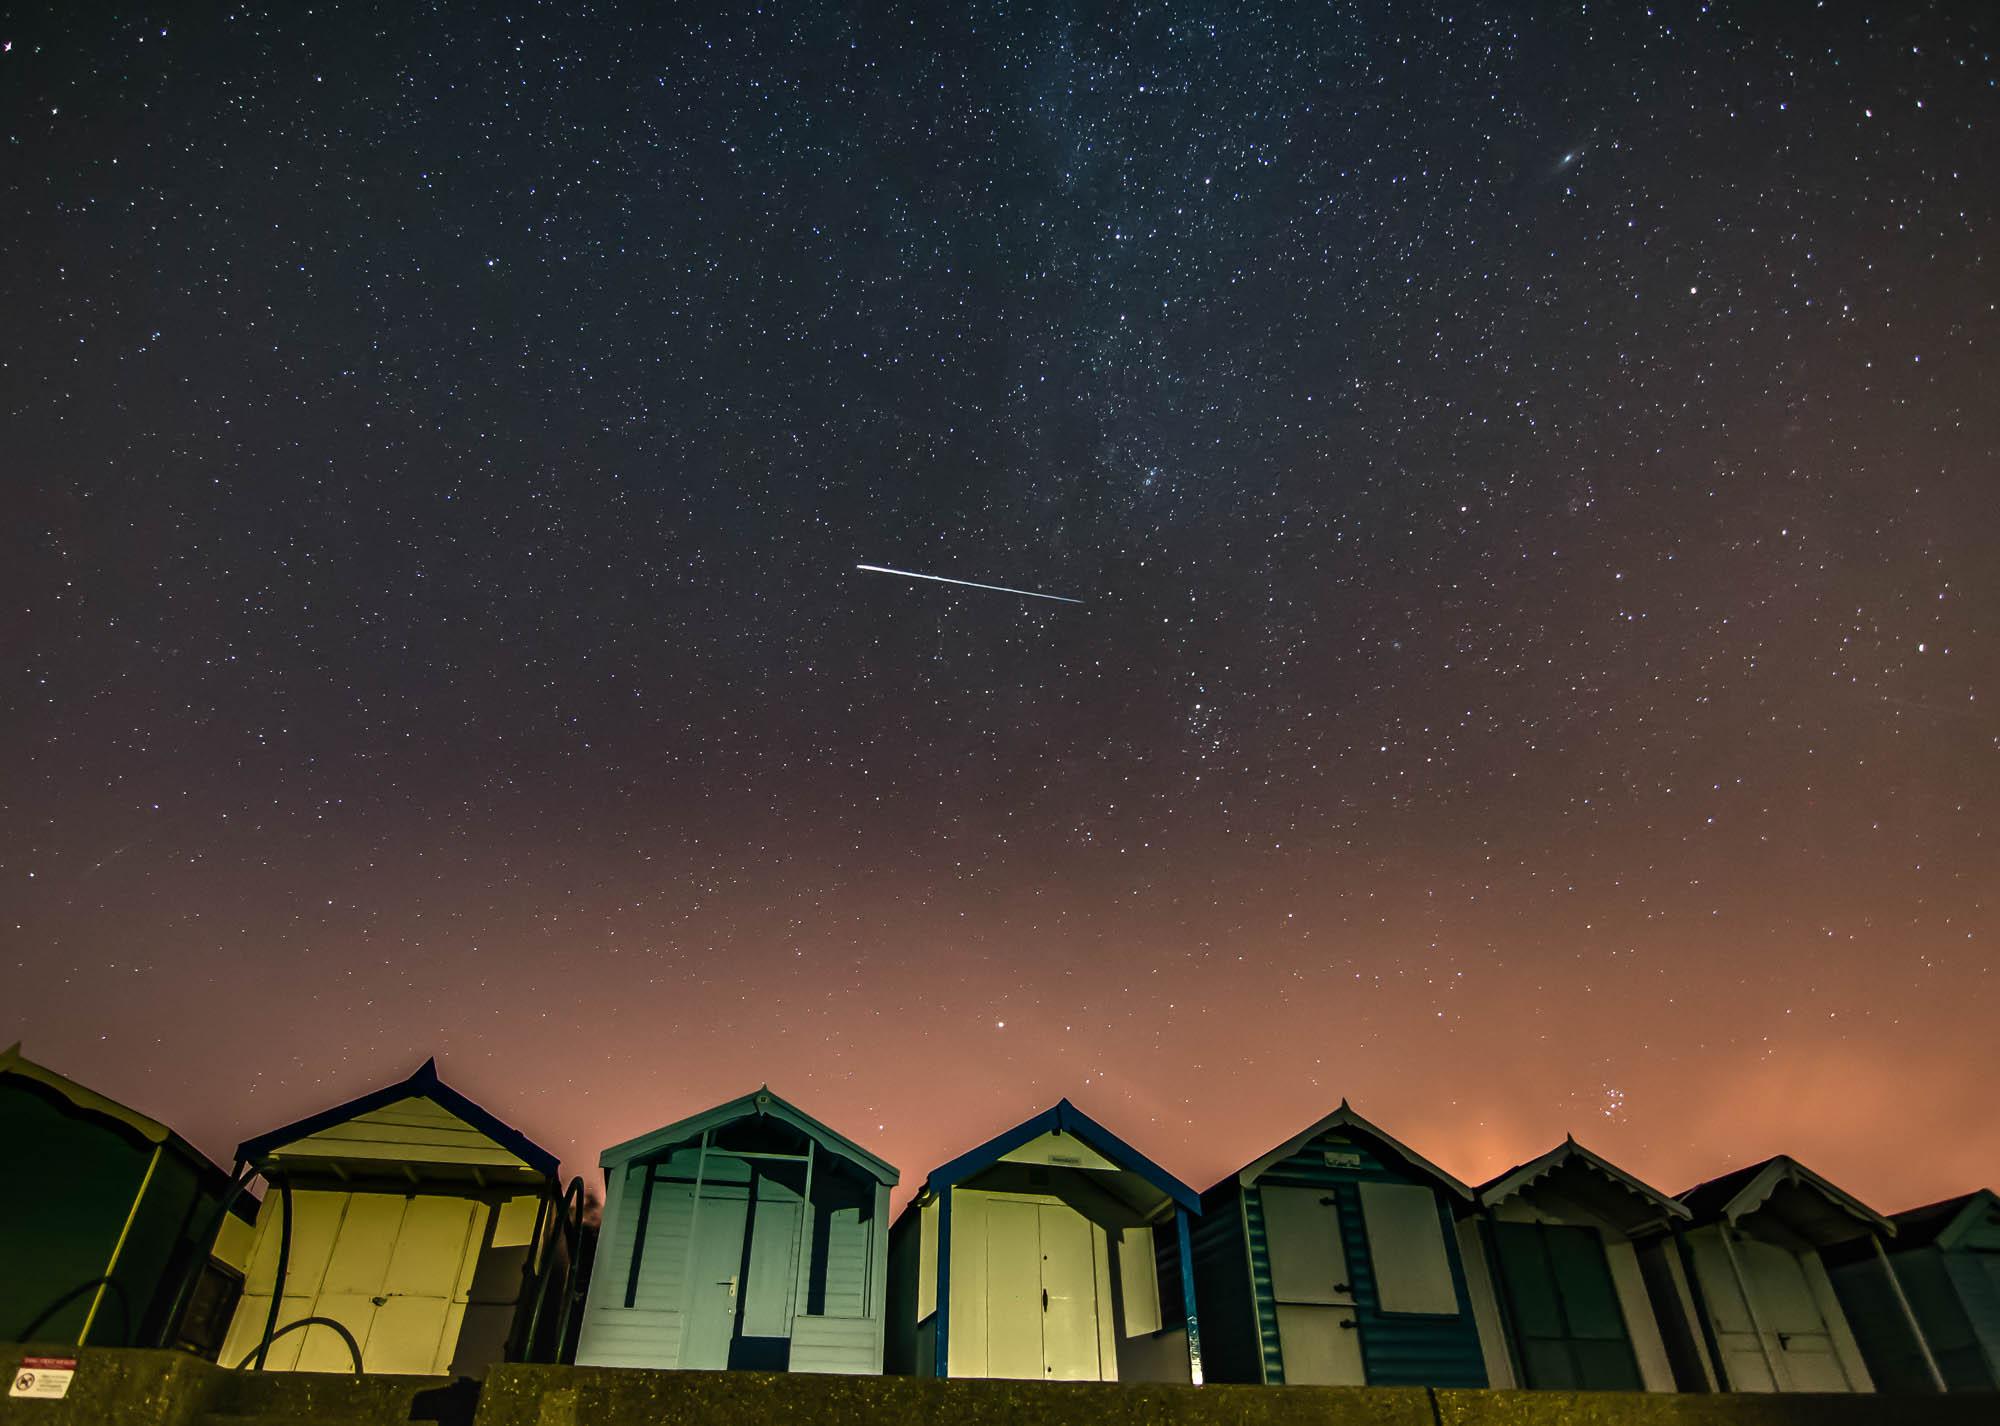 A Perseid meteor streaks across a star filled sky above Brightlingsea beach on an August night.